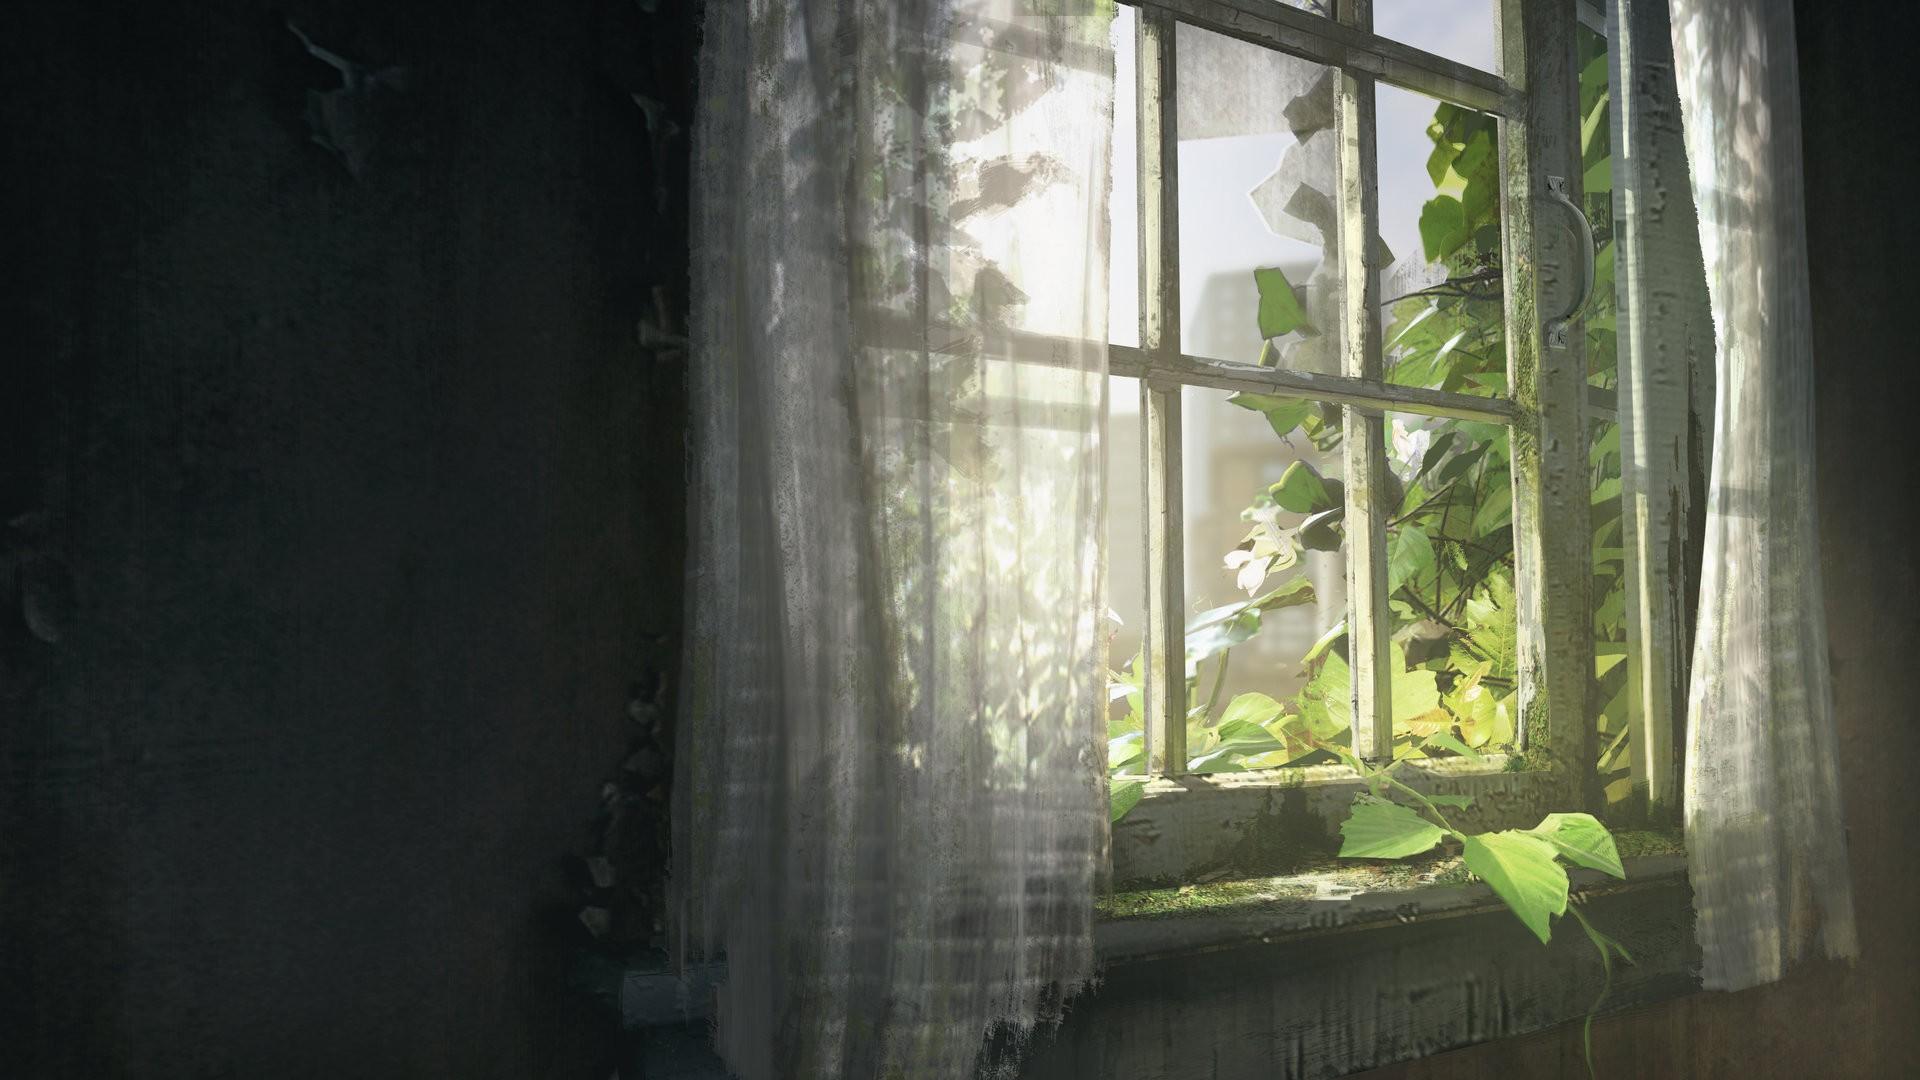 Last Of Us Wallpaper Download Free Beautiful High Resolution